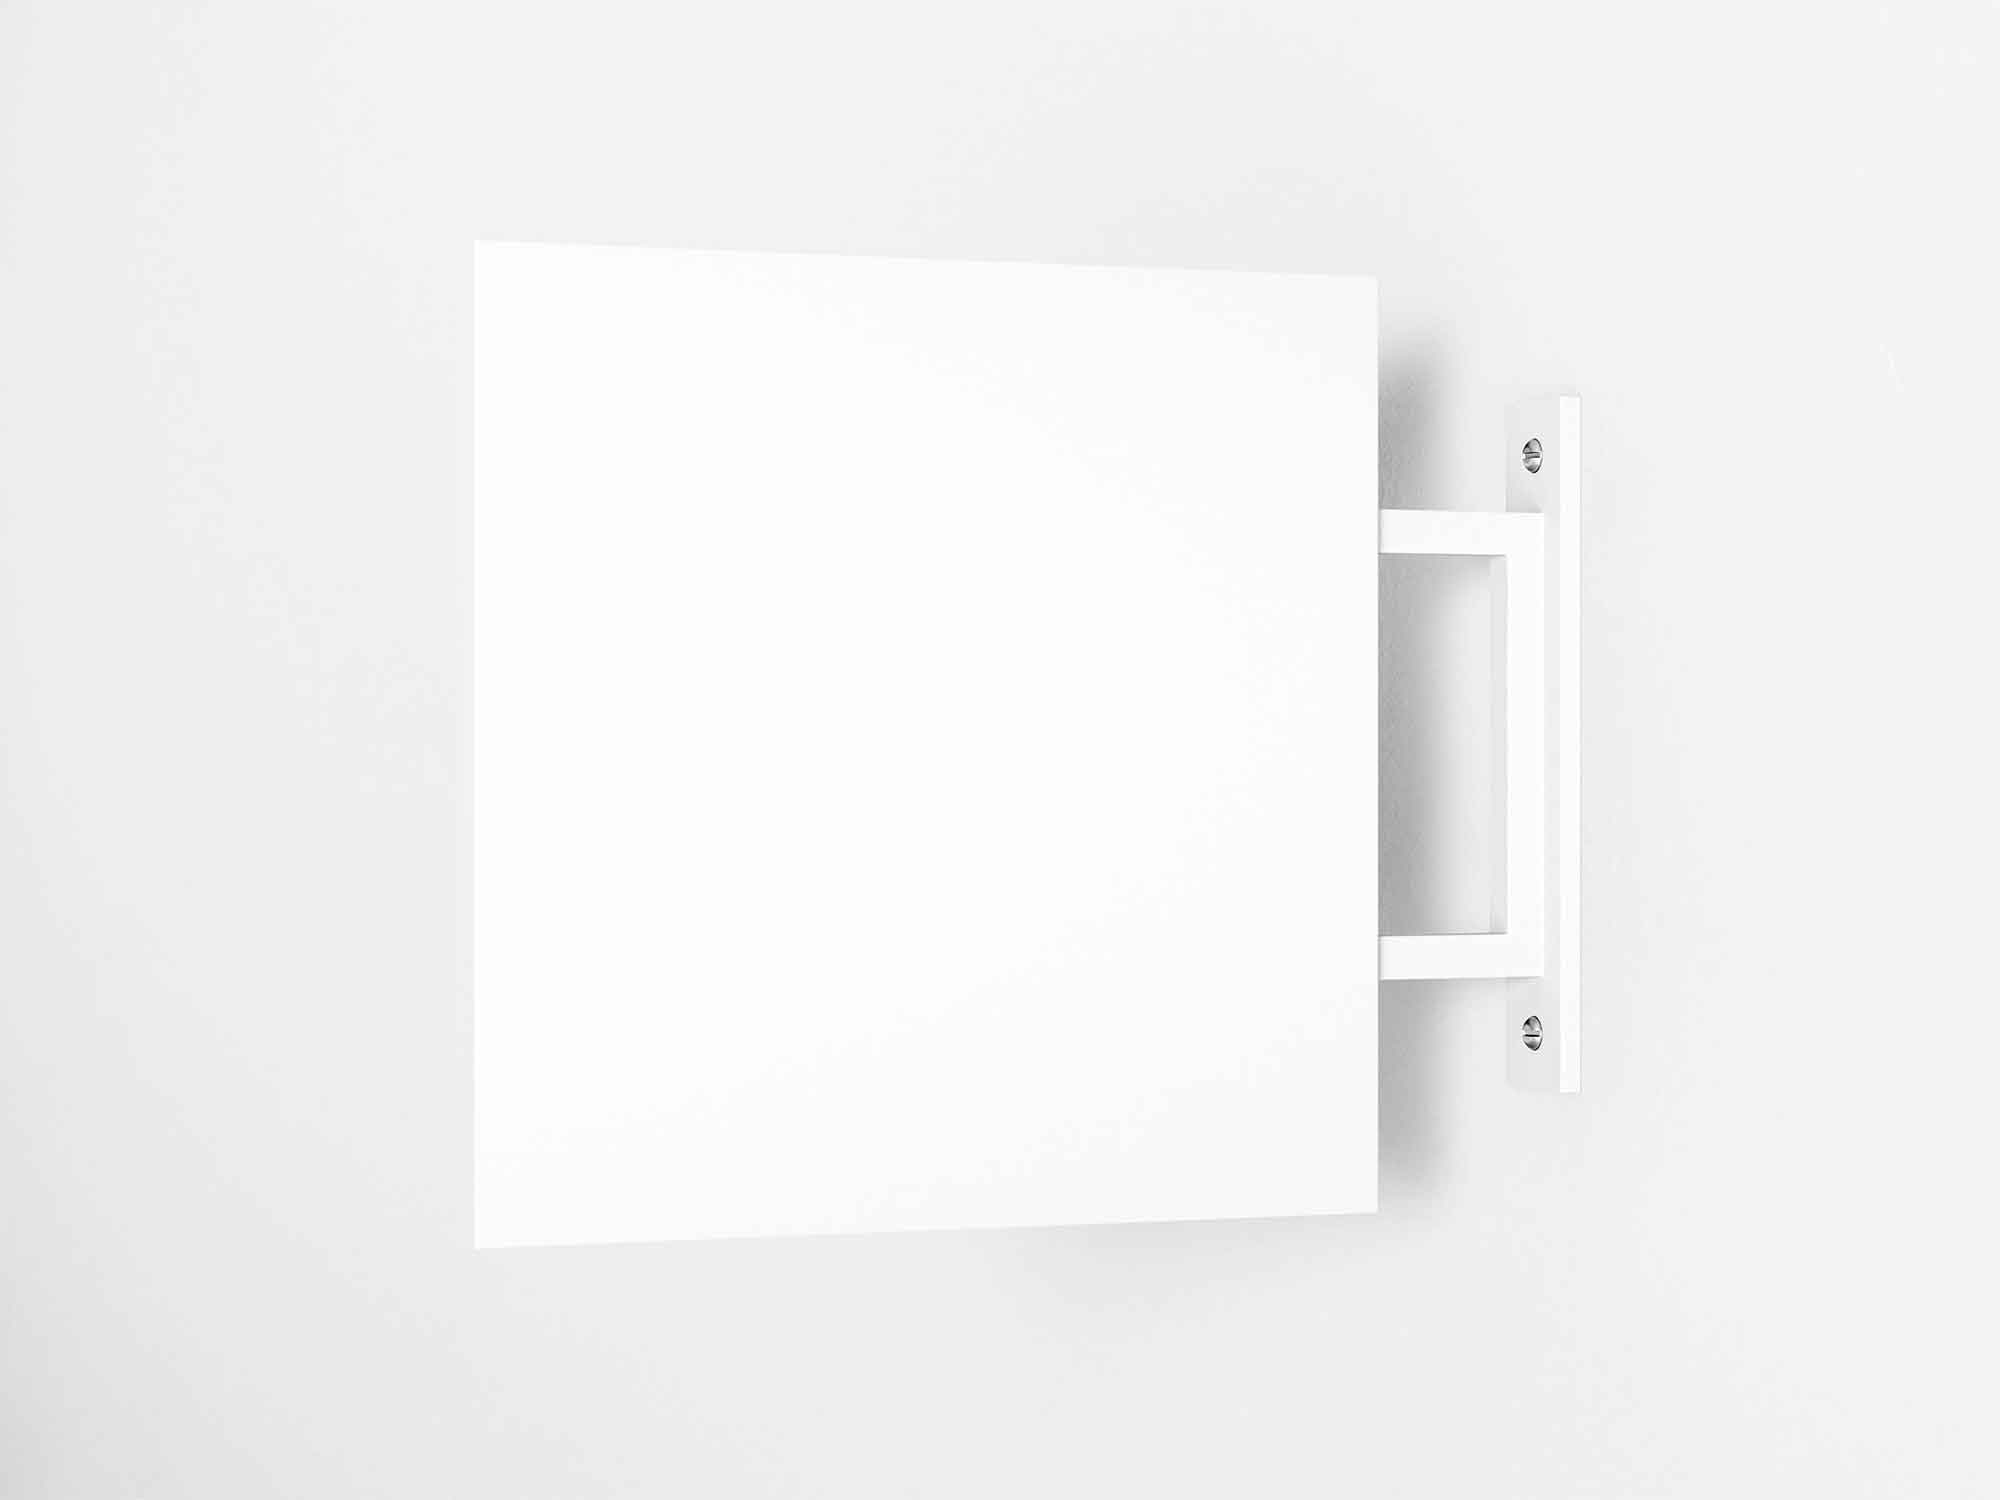 Minimalistic Wall Sign Mockup 2